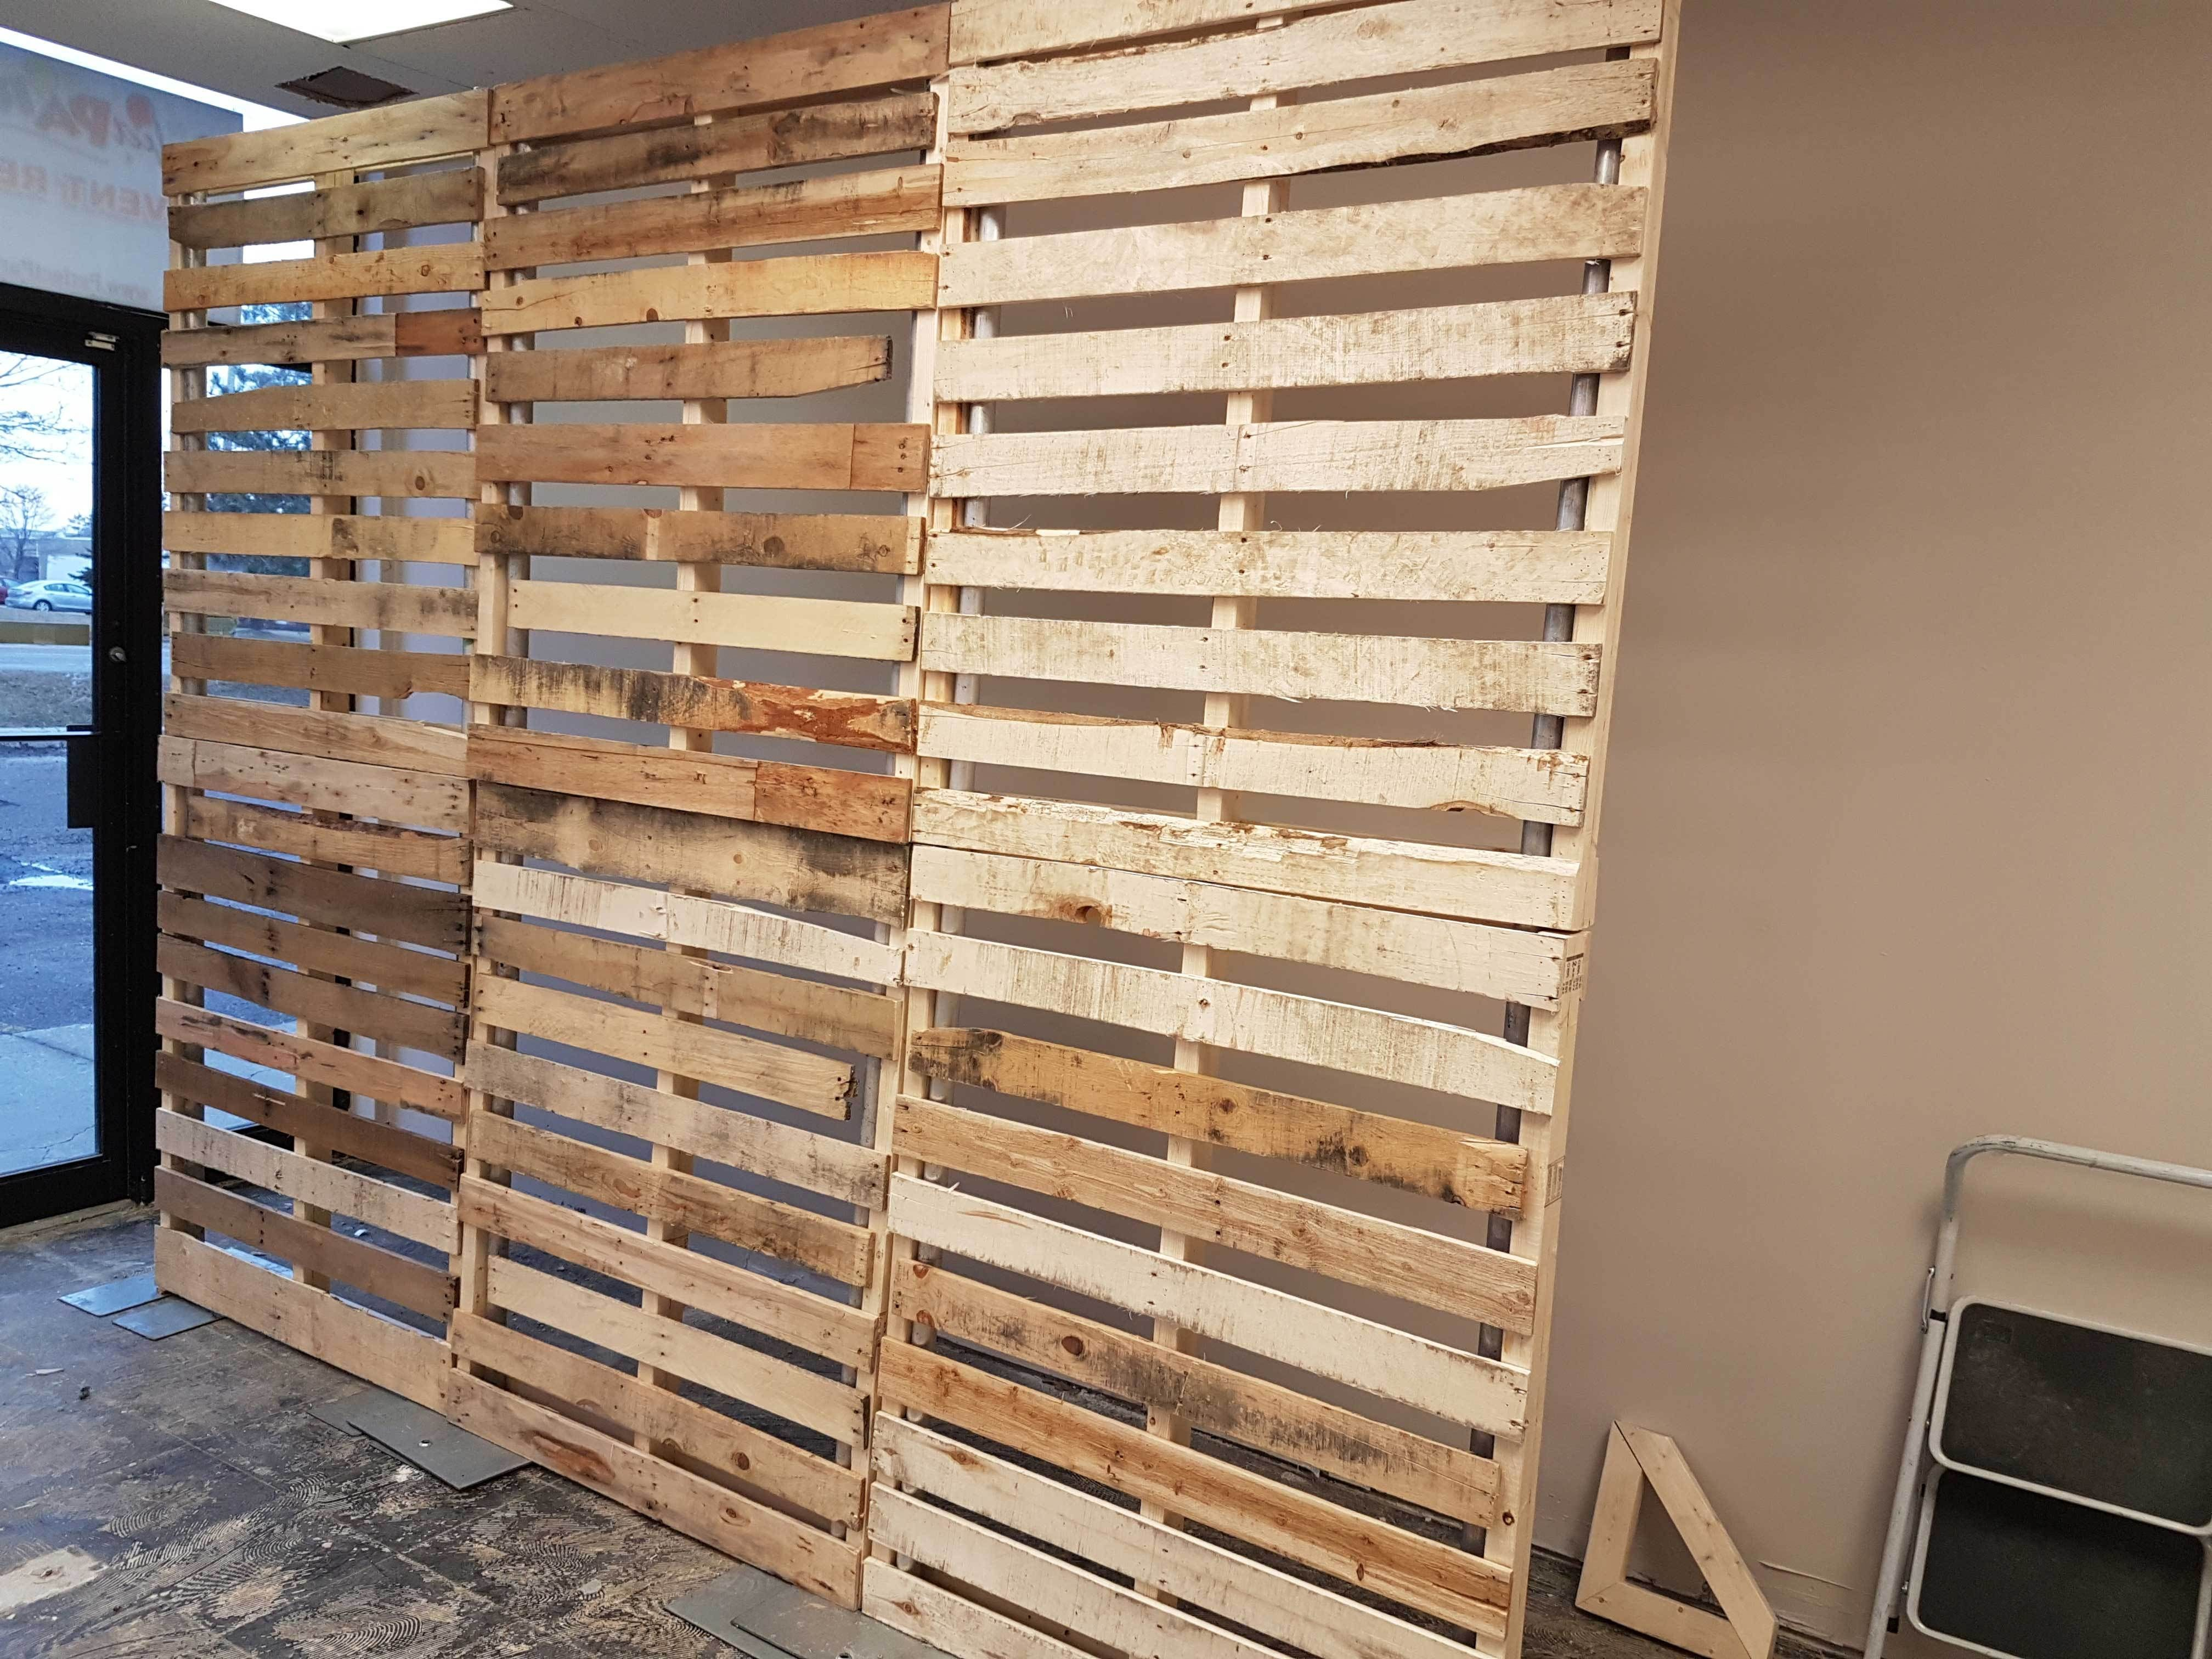 Pallet Wall Backdrop Wall Backdrops Pallet Backdrop Diy Pallet